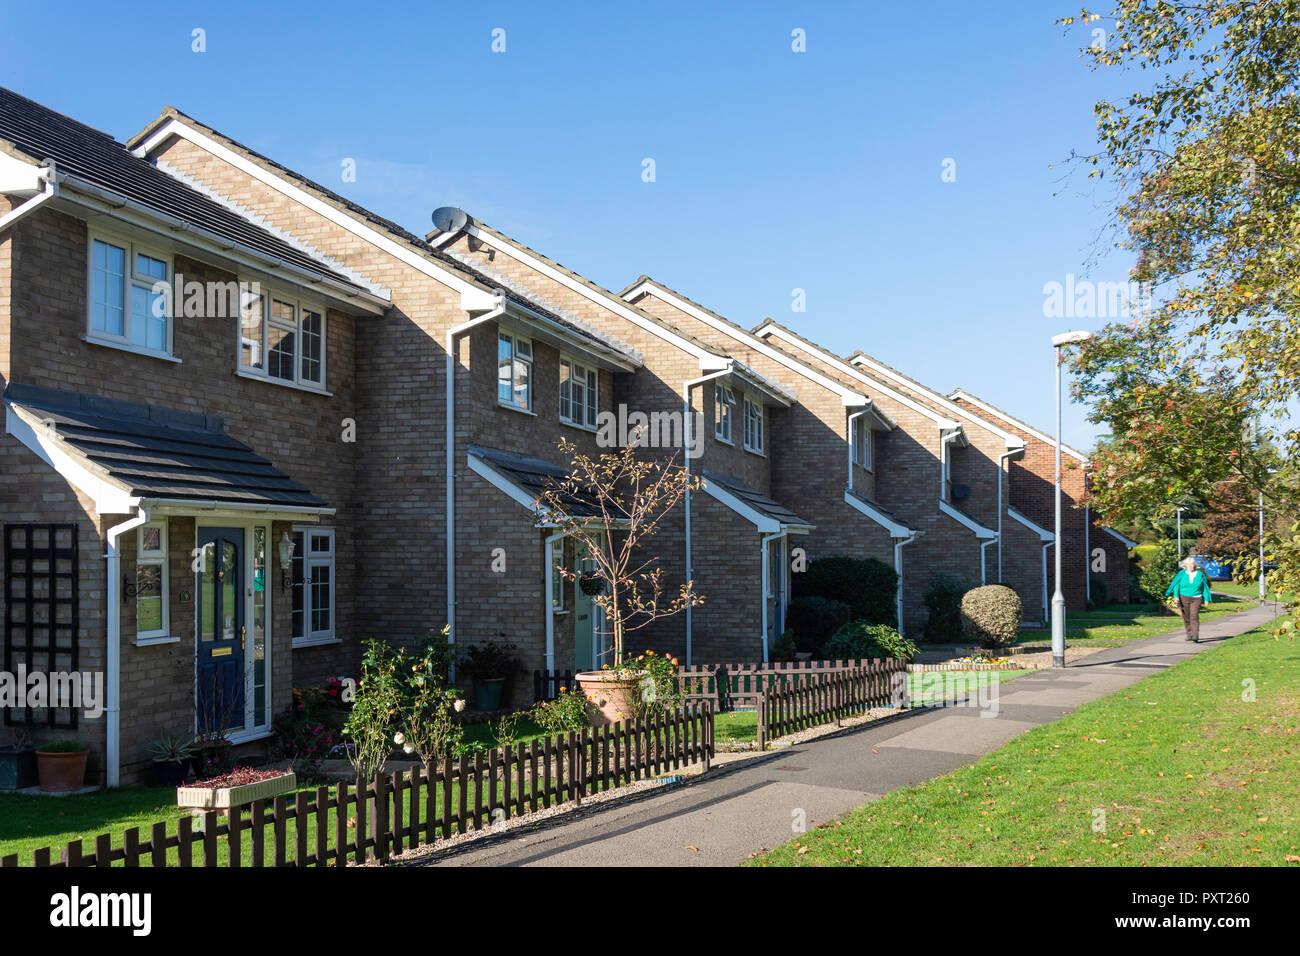 Terraced houses, Knox Green, Binfield, Berkshire, England, United Kingdom - Stock Image